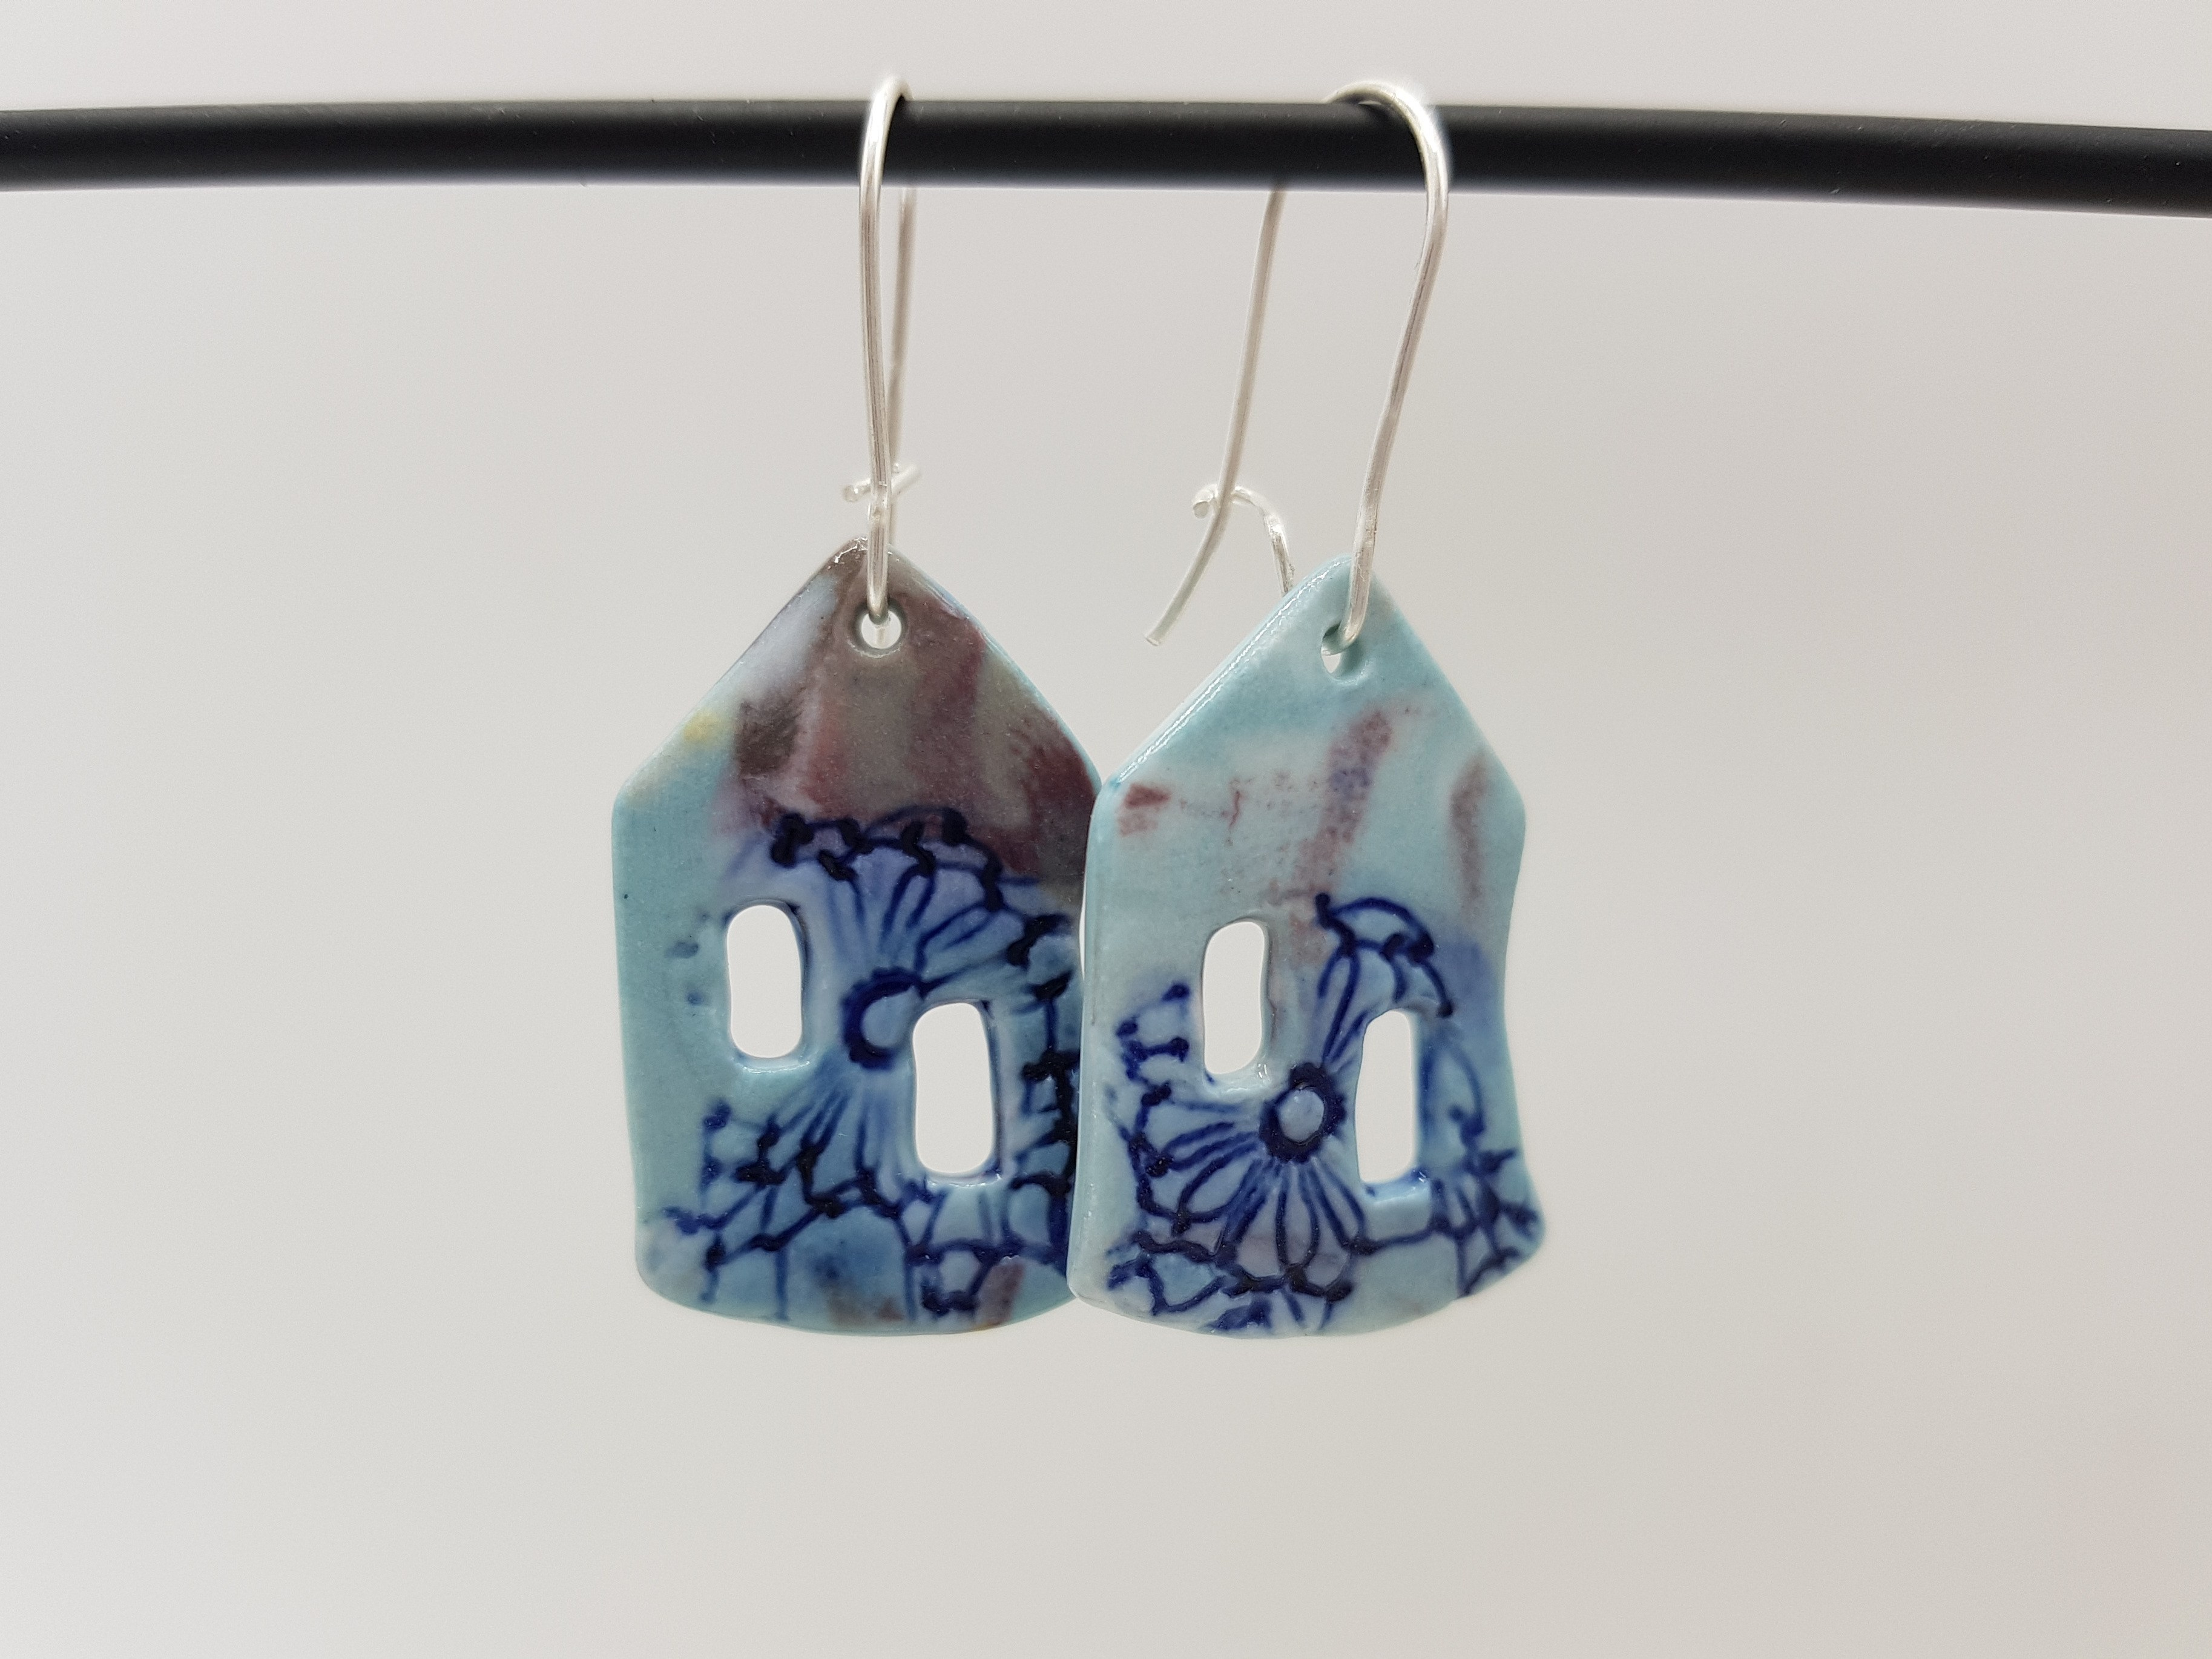 Boucles d'oreilles Maison - Collection Burano - Coloris Bleu clair